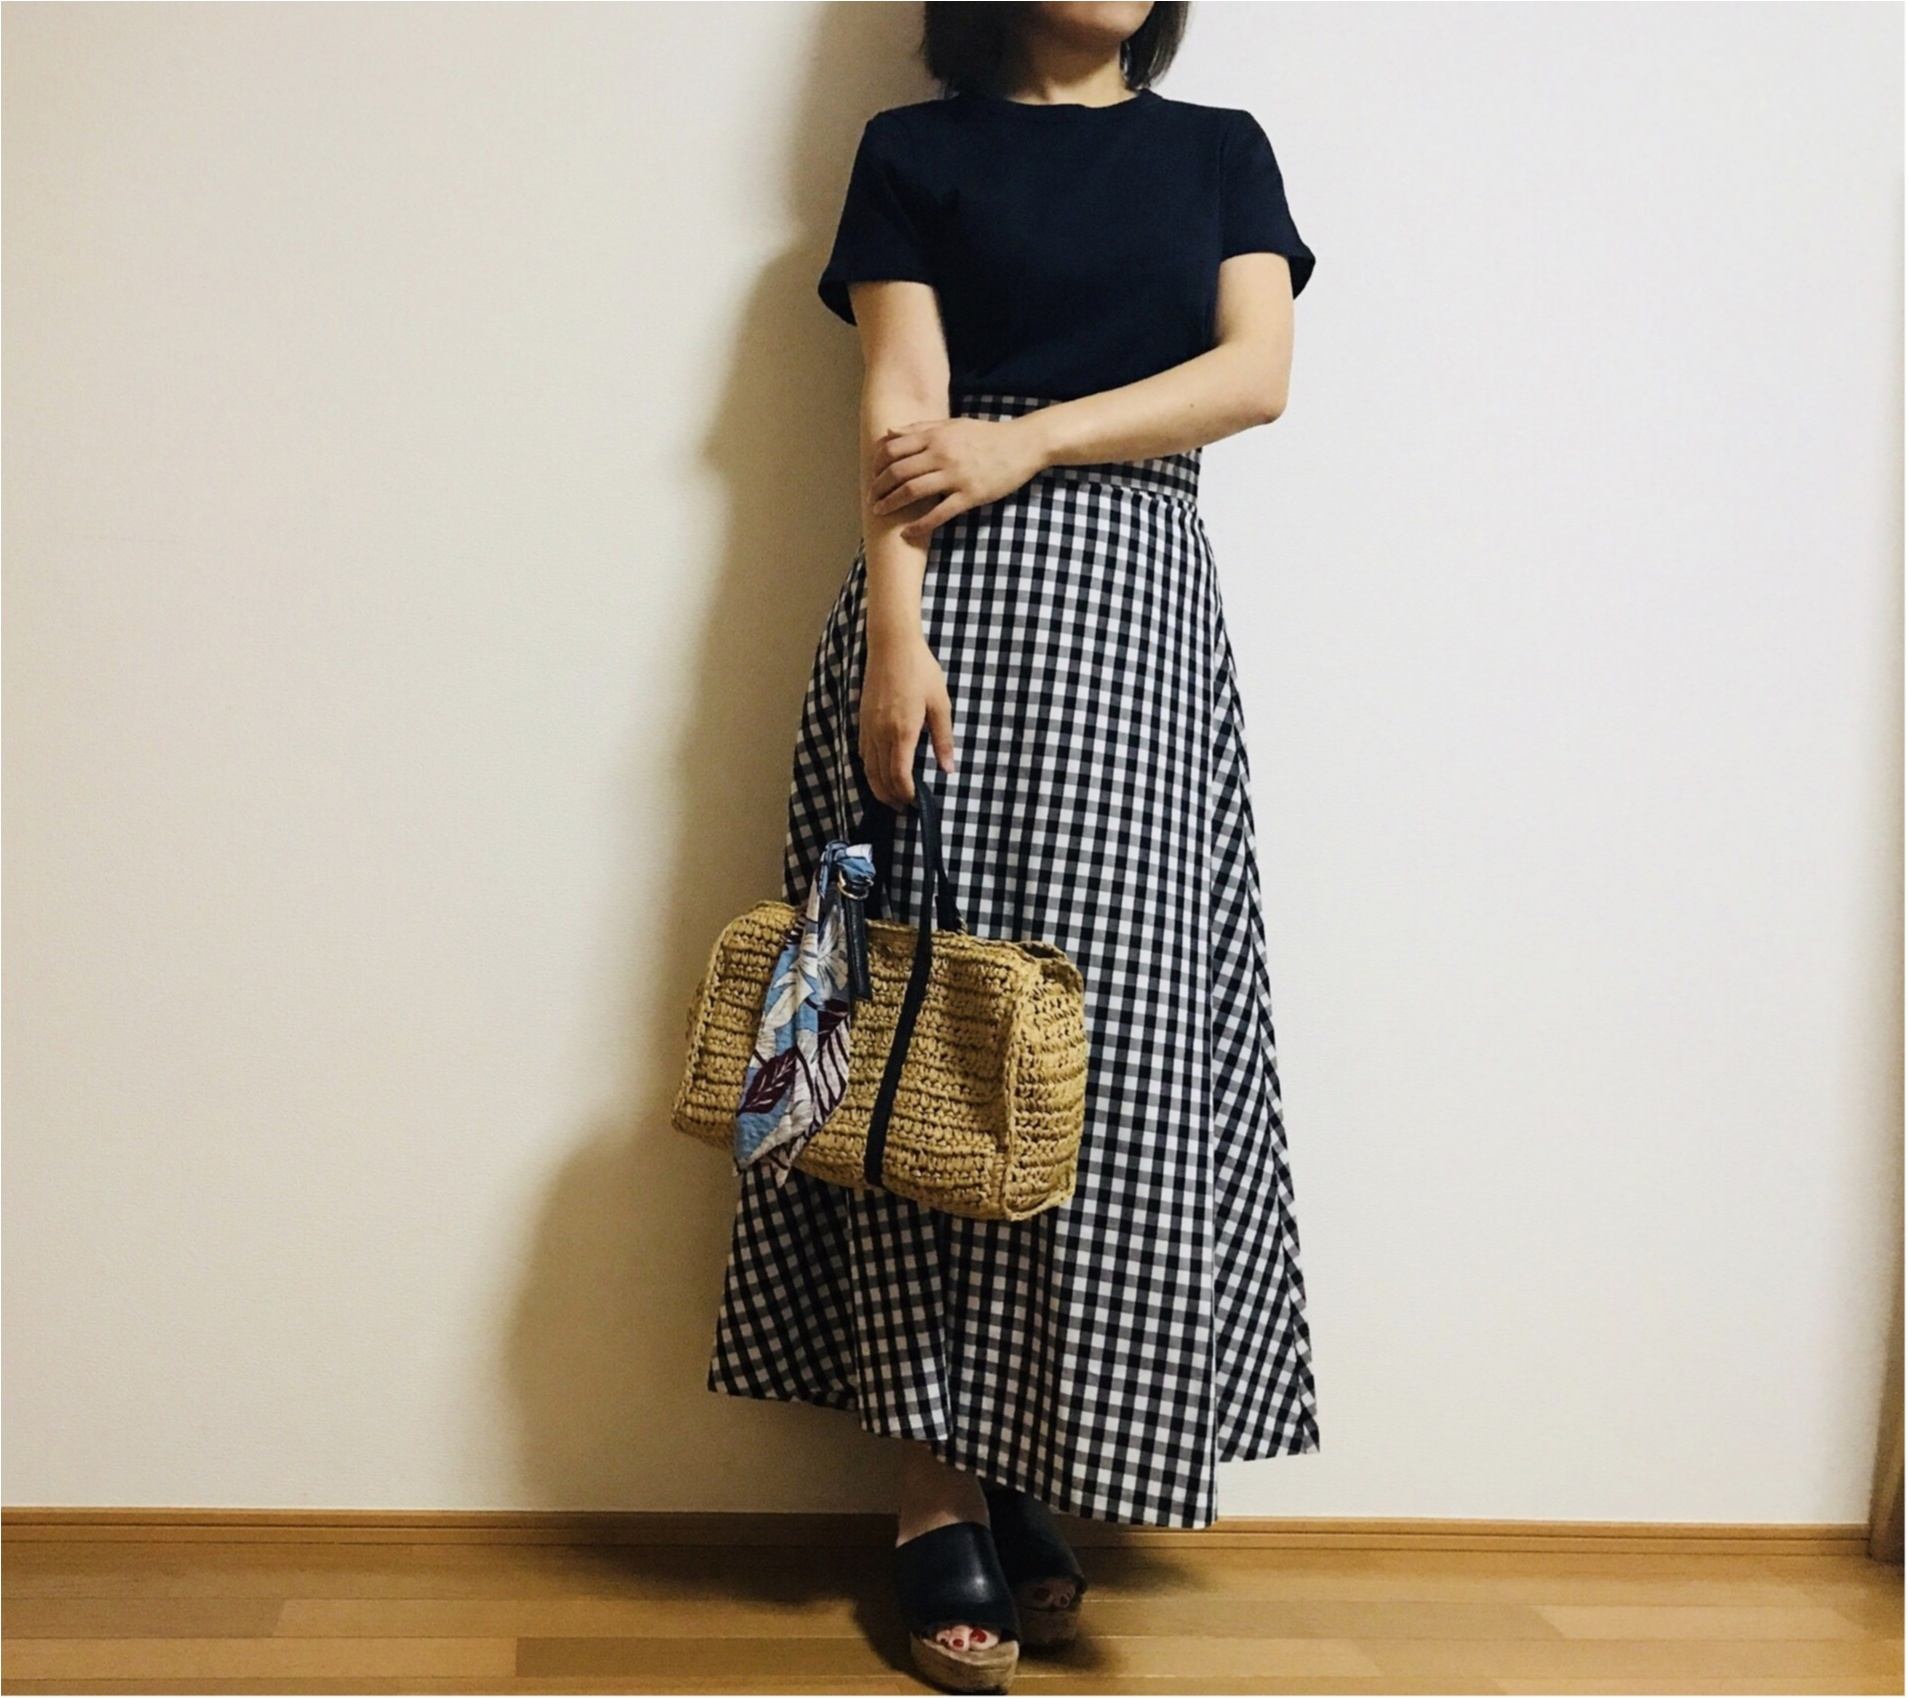 『GU』記事がファッションカテゴリTOP3を独占★ 【今週のモアハピ部人気ランキング】_2